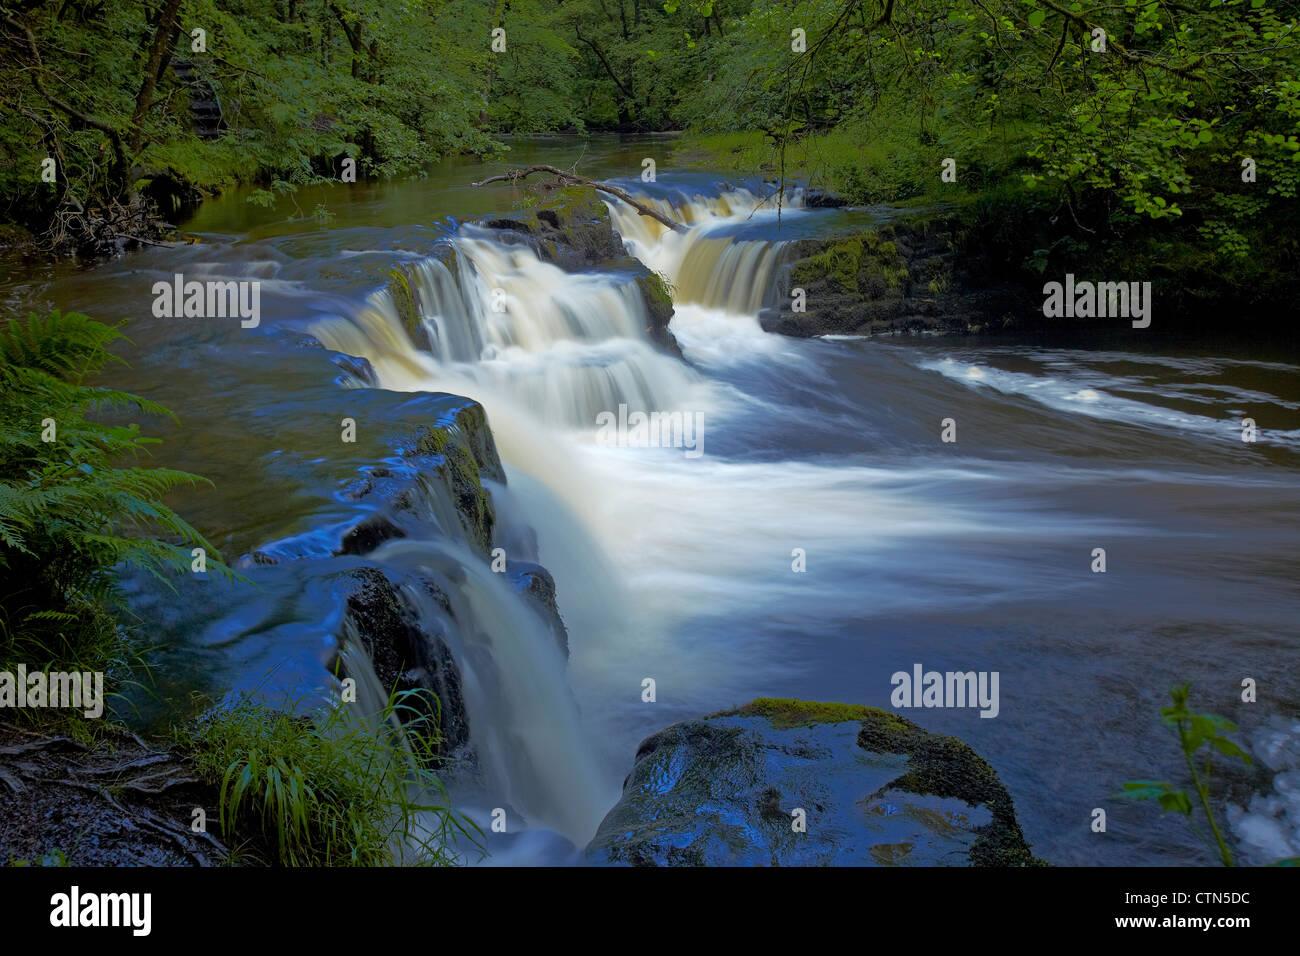 Moss Covered Sgwd Ddwli Uchaf Waterfalls On The River Neath Pontneddfechan In South Wales